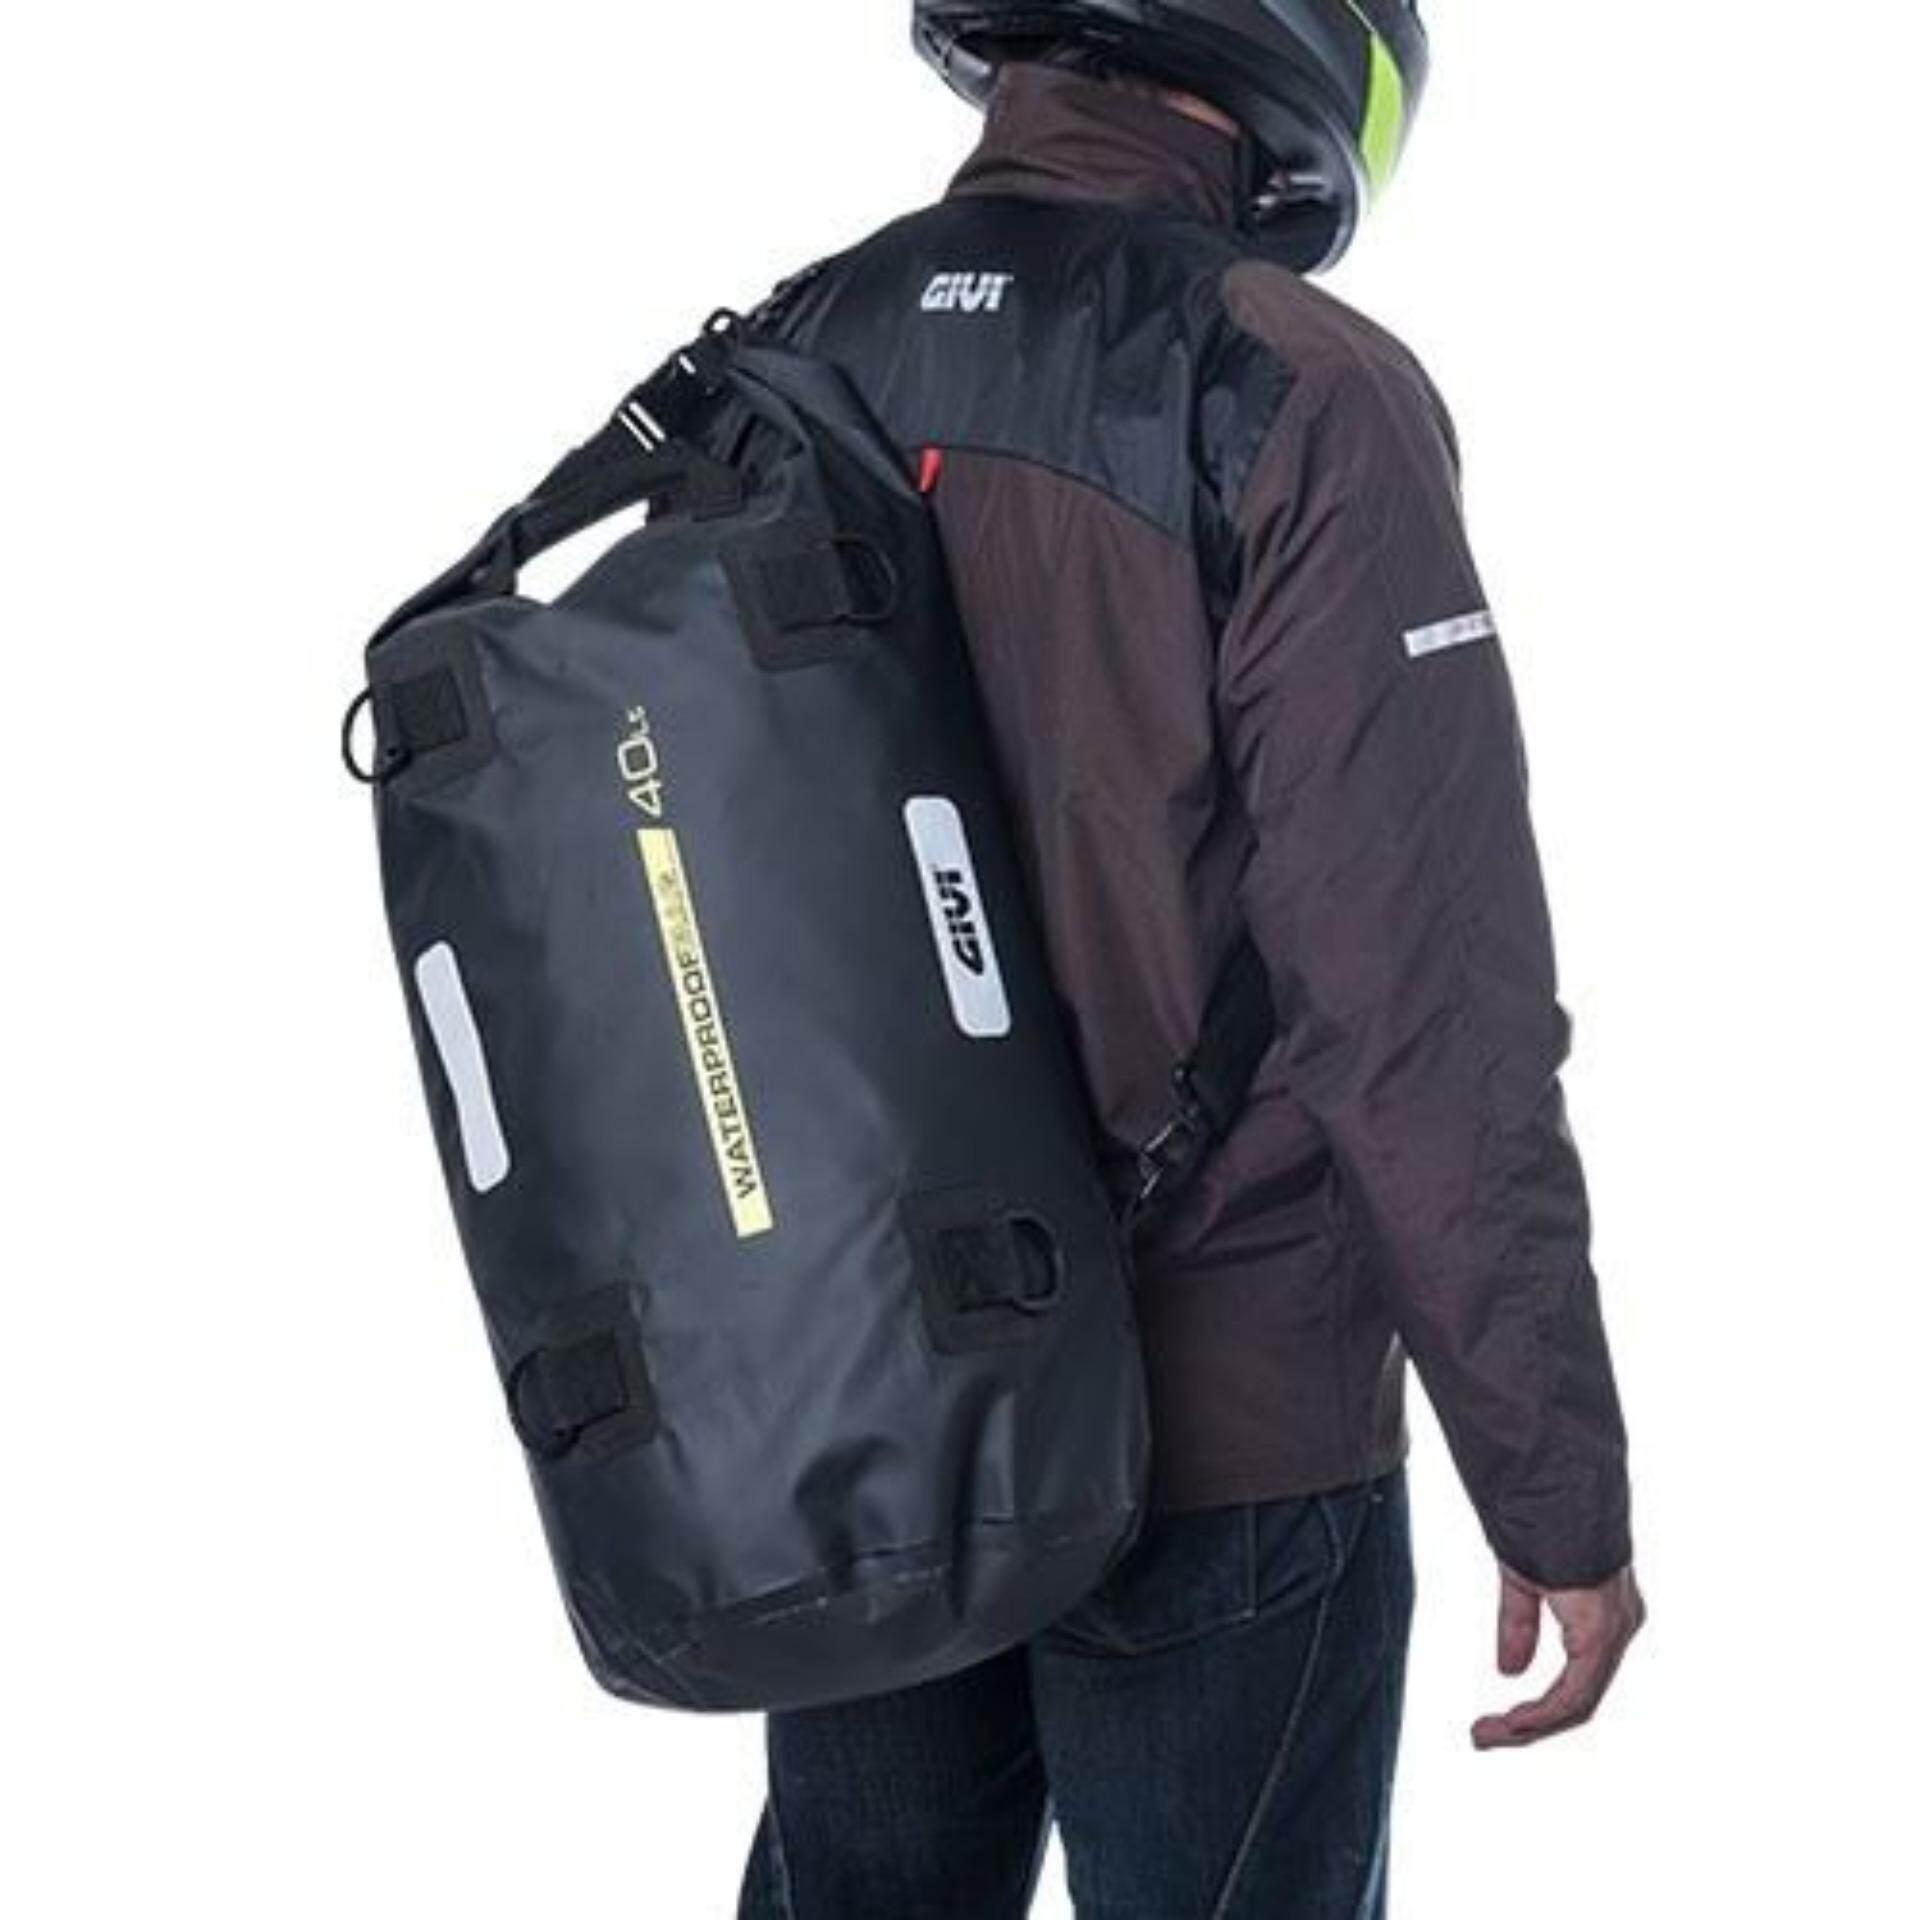 Original Givi PCB01 Waterproof 40 Litre Prime Cargo Bag